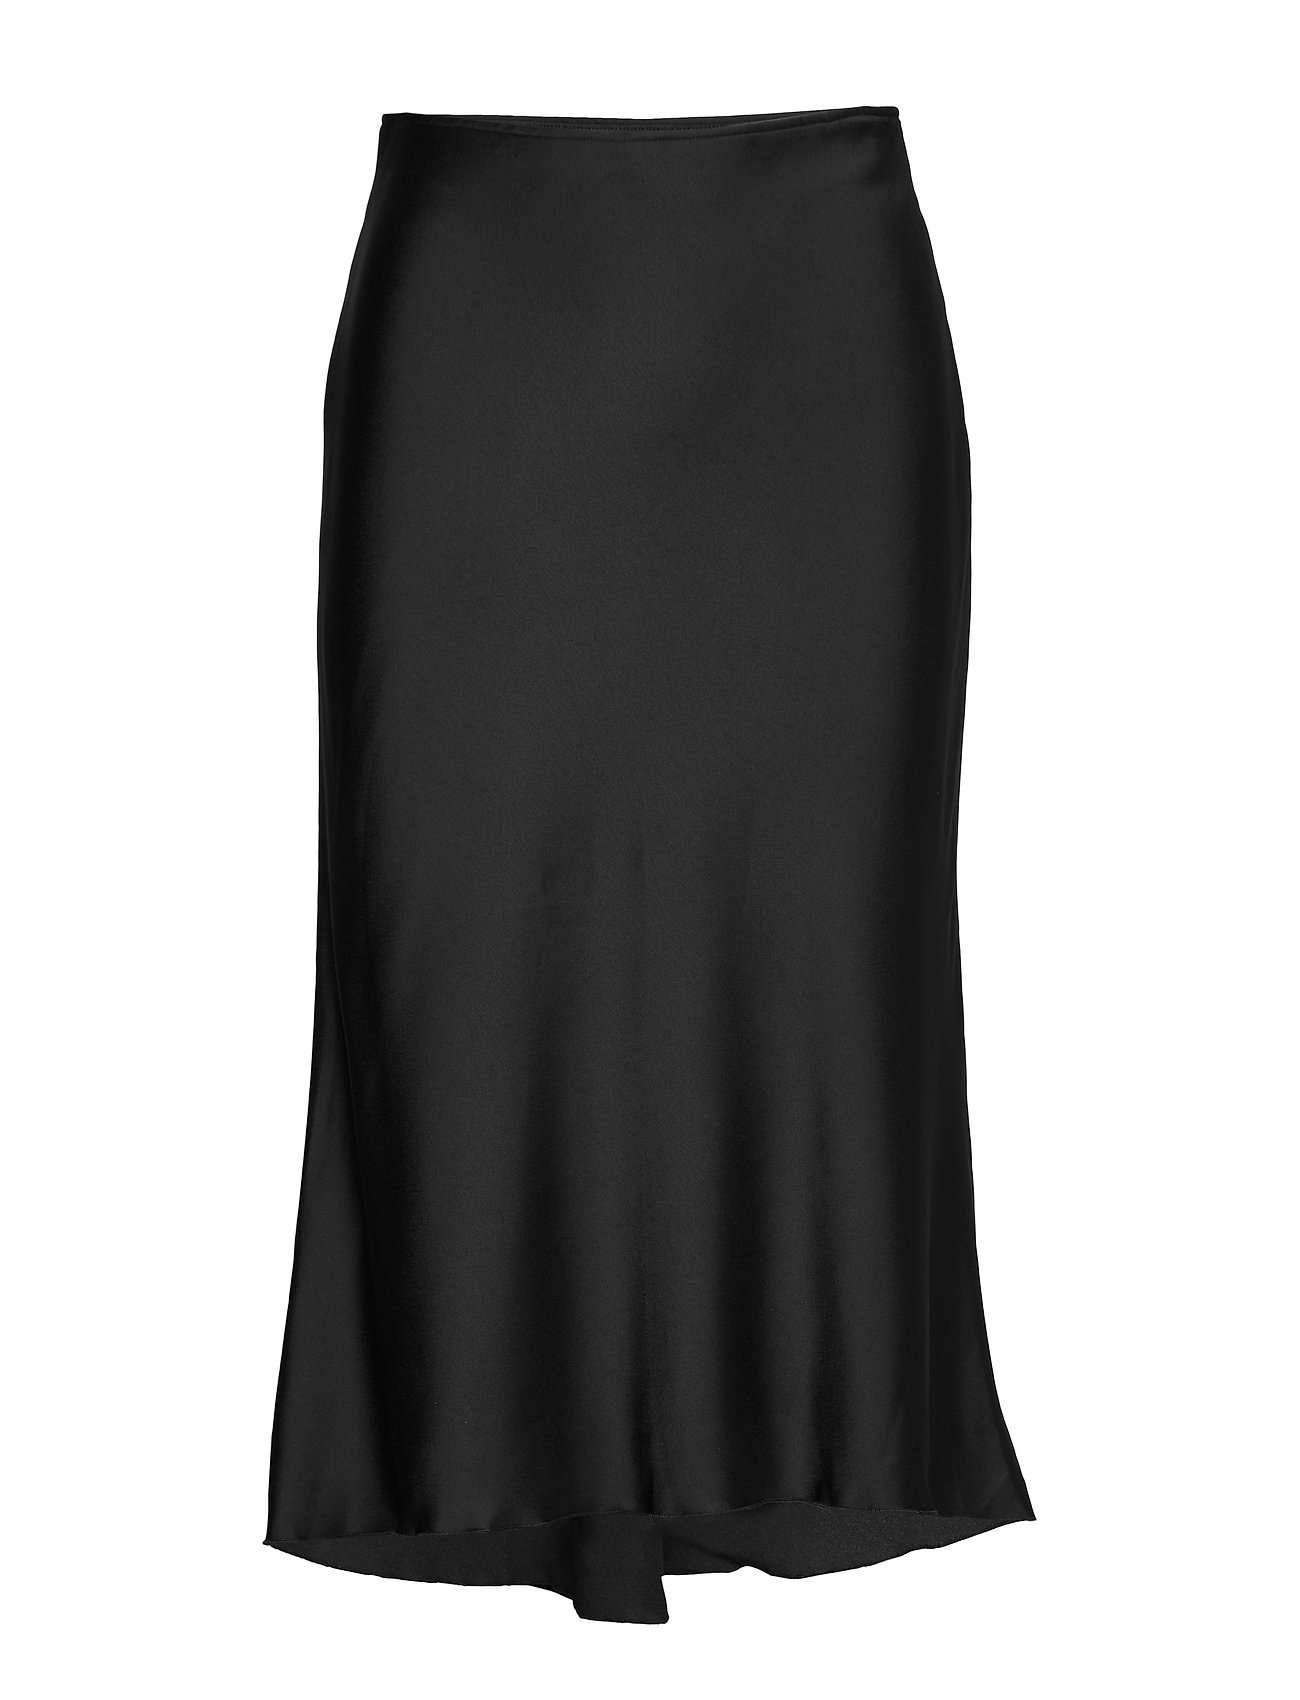 Abercrombie & Fitch High-Low Midi Skirt - BLACK DD